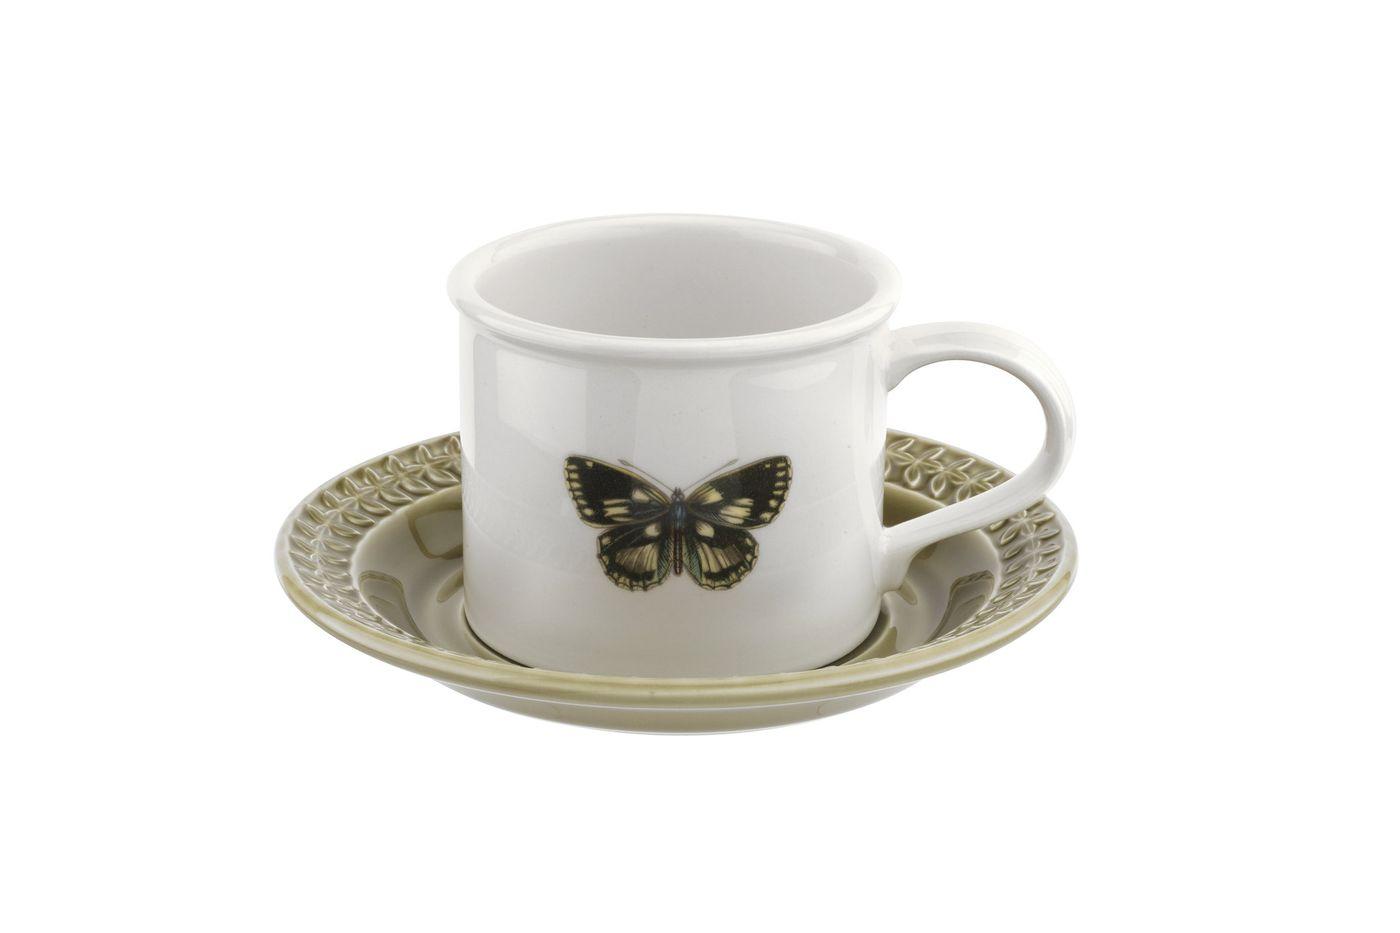 Portmeirion Botanic Garden Harmony Breakfast Cup & Saucer Moss Green 260ml thumb 1